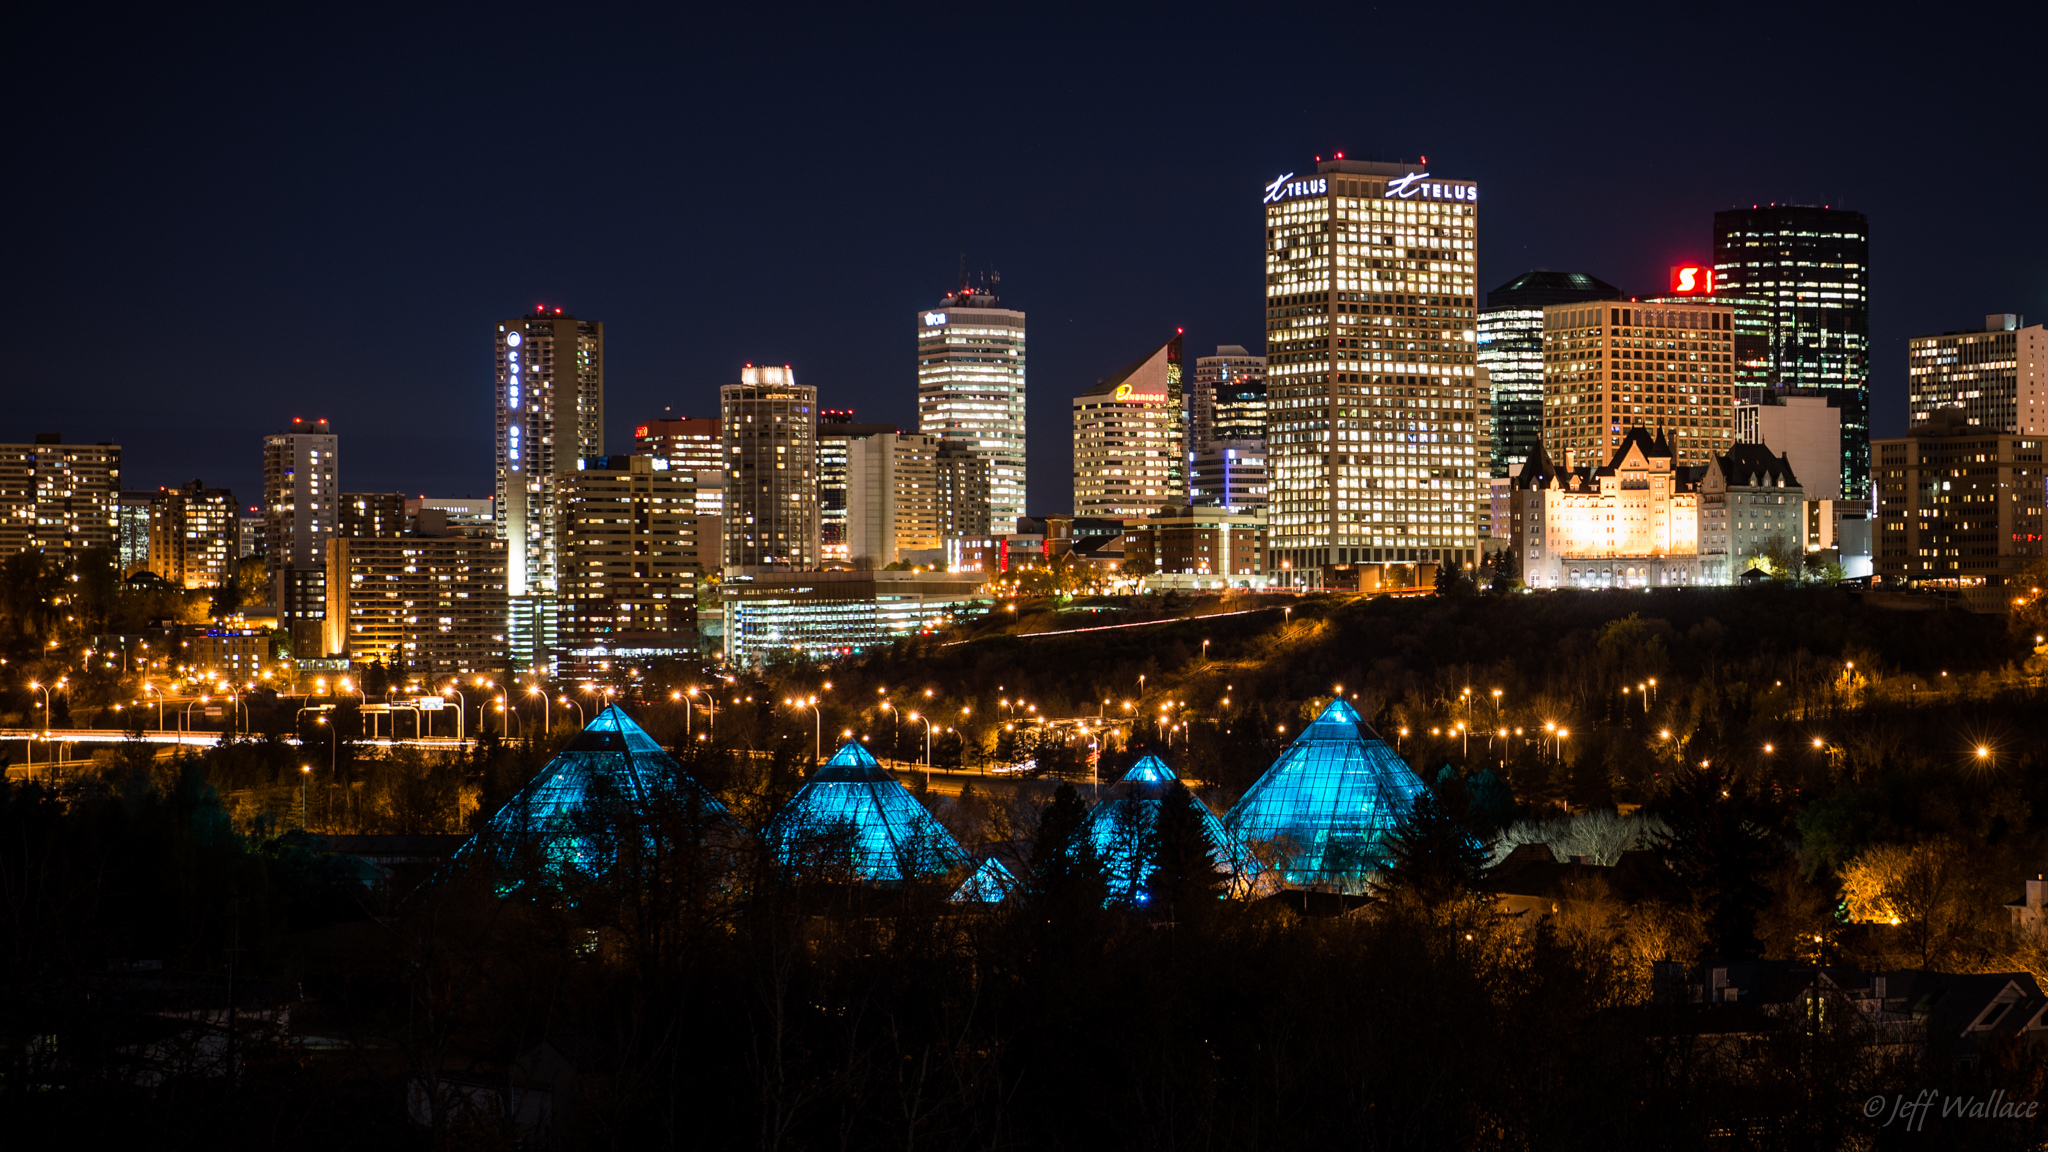 Edmonton Skyline by Jeff Wallace from Flickr